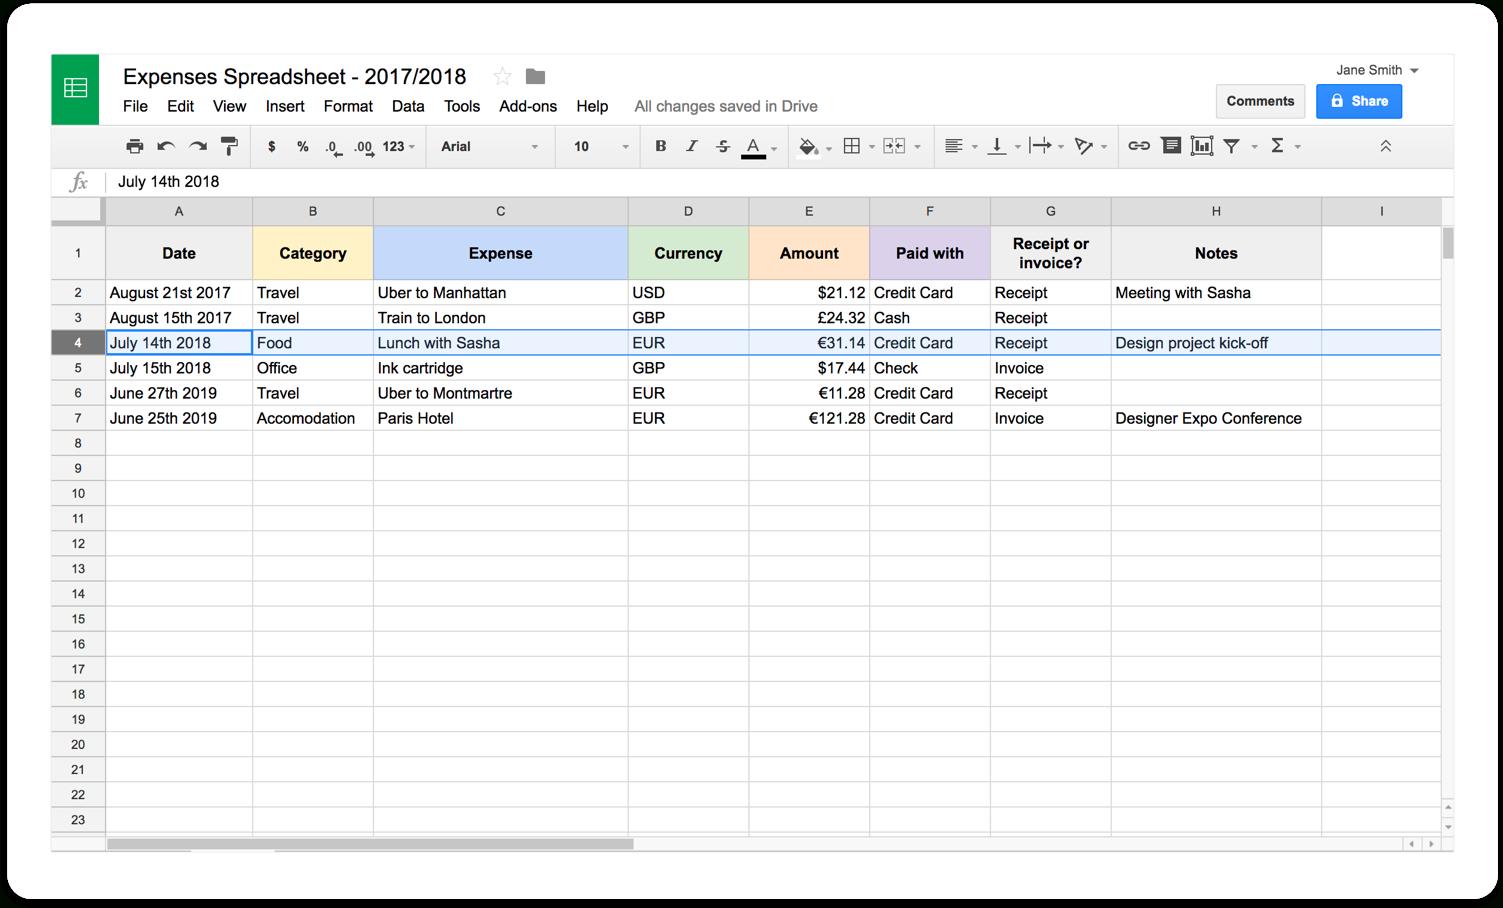 Self Employed Expense Spreadsheet With Regard To Selfemployed Expenses Spreadsheet